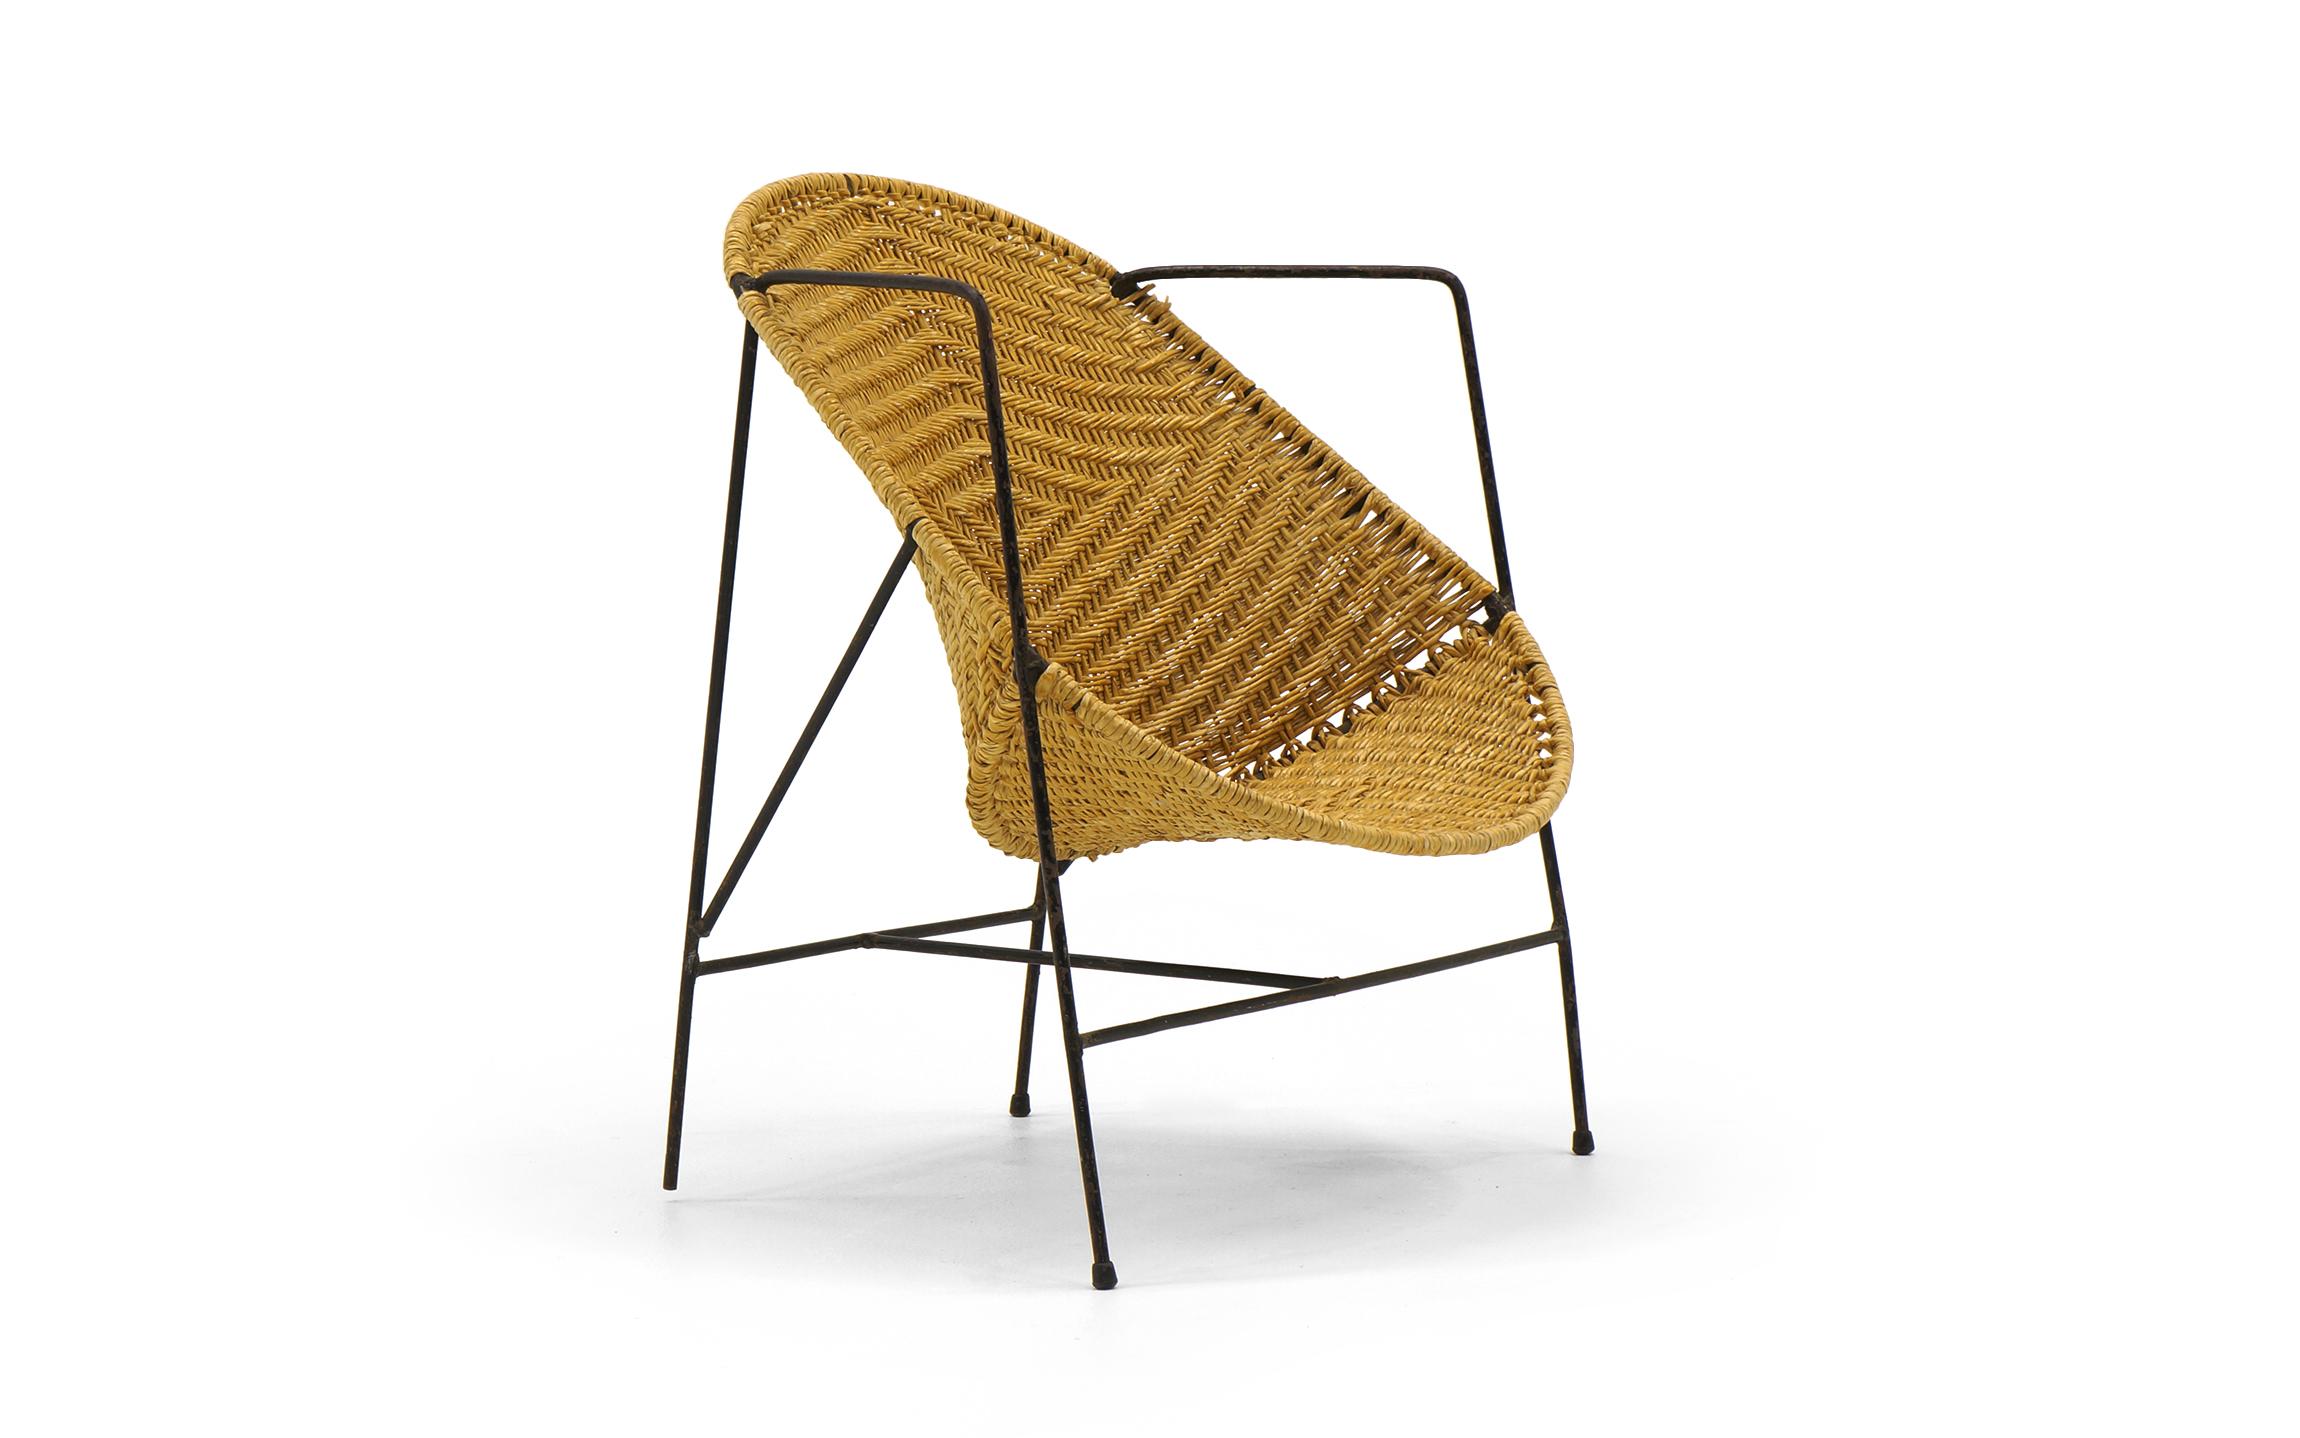 John Salterini Childs Chair Wrought Iron And Wicker Retro Inferno